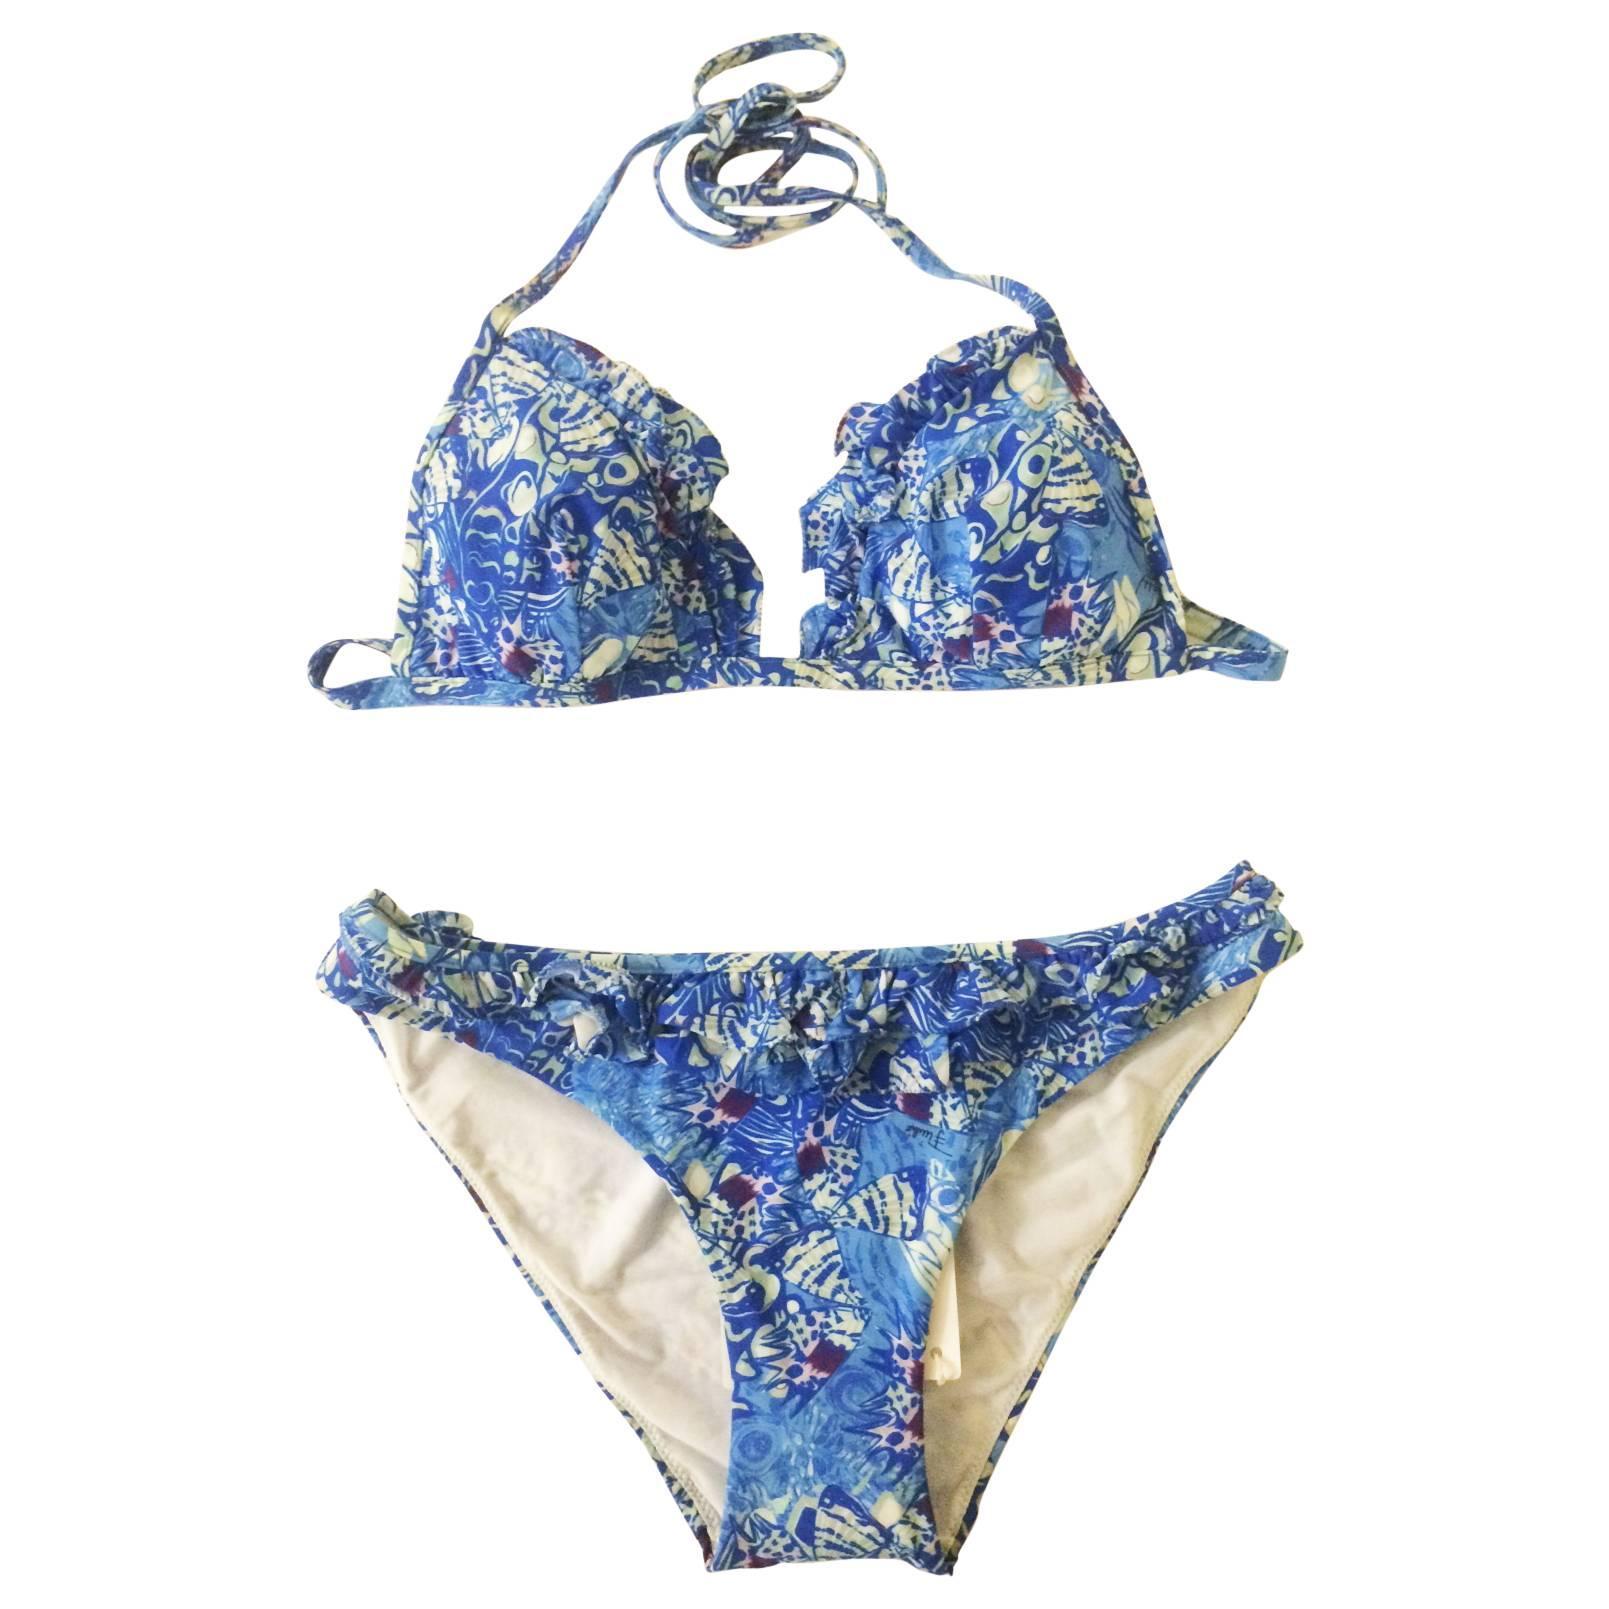 Emilio Pucci Blue Butterfly Wing Print Bikini Swim Suit with Ruffle Trim